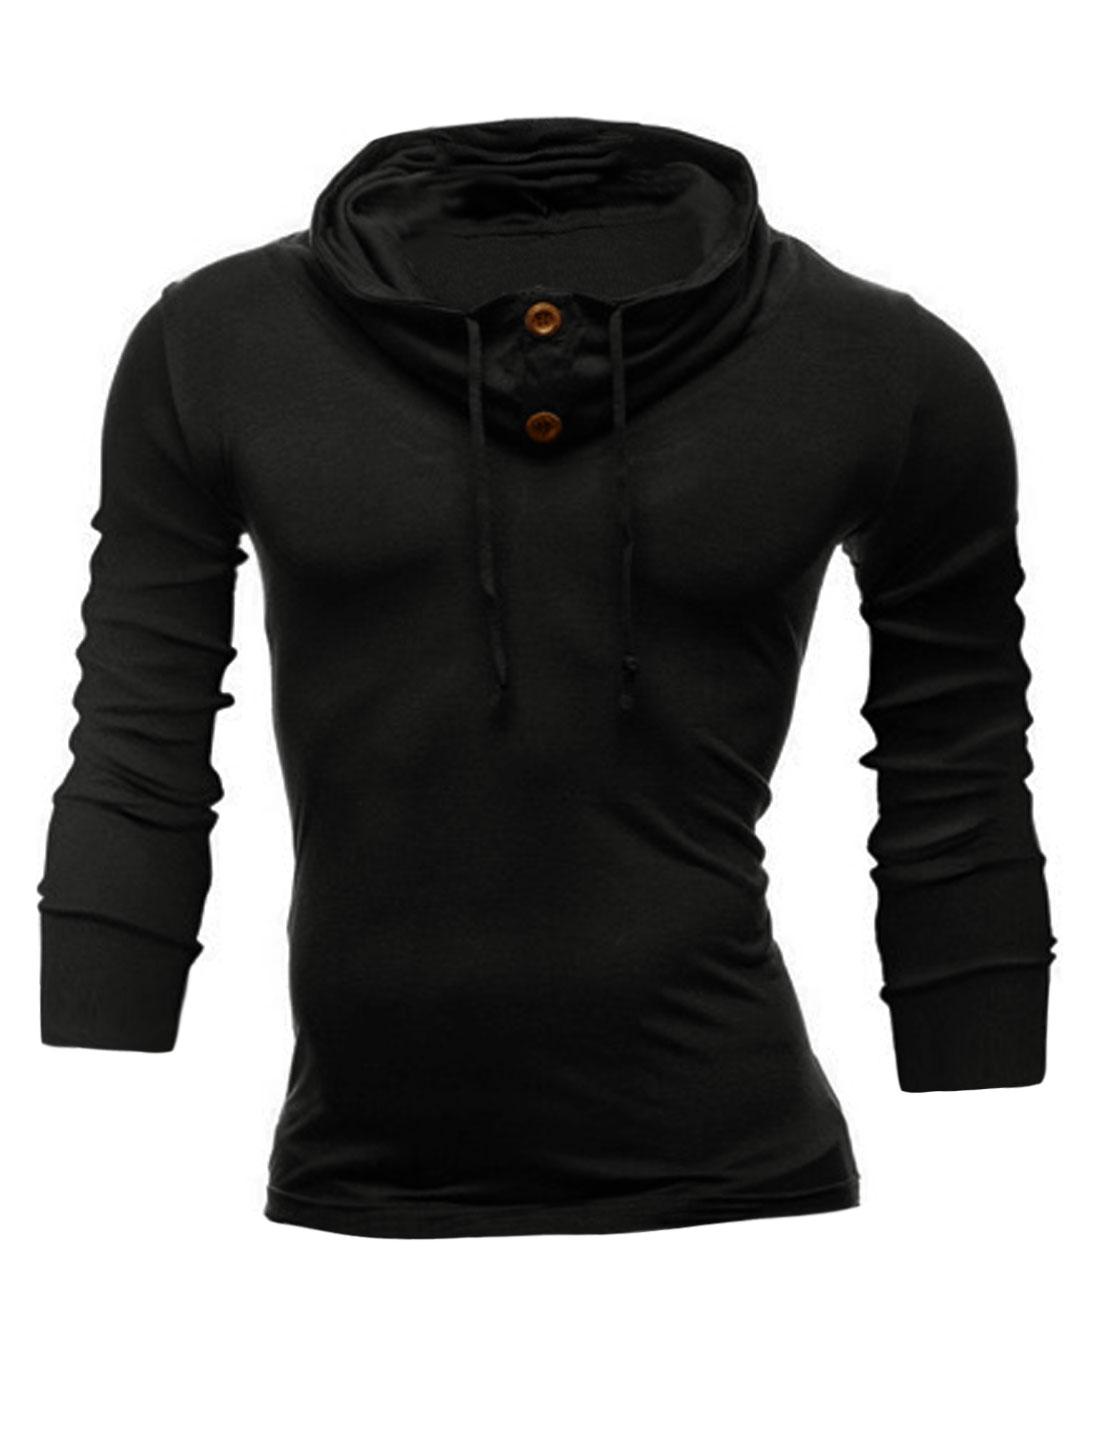 Men Funnel Neck Long Sleeves Drawstring Sweatshirt Black M